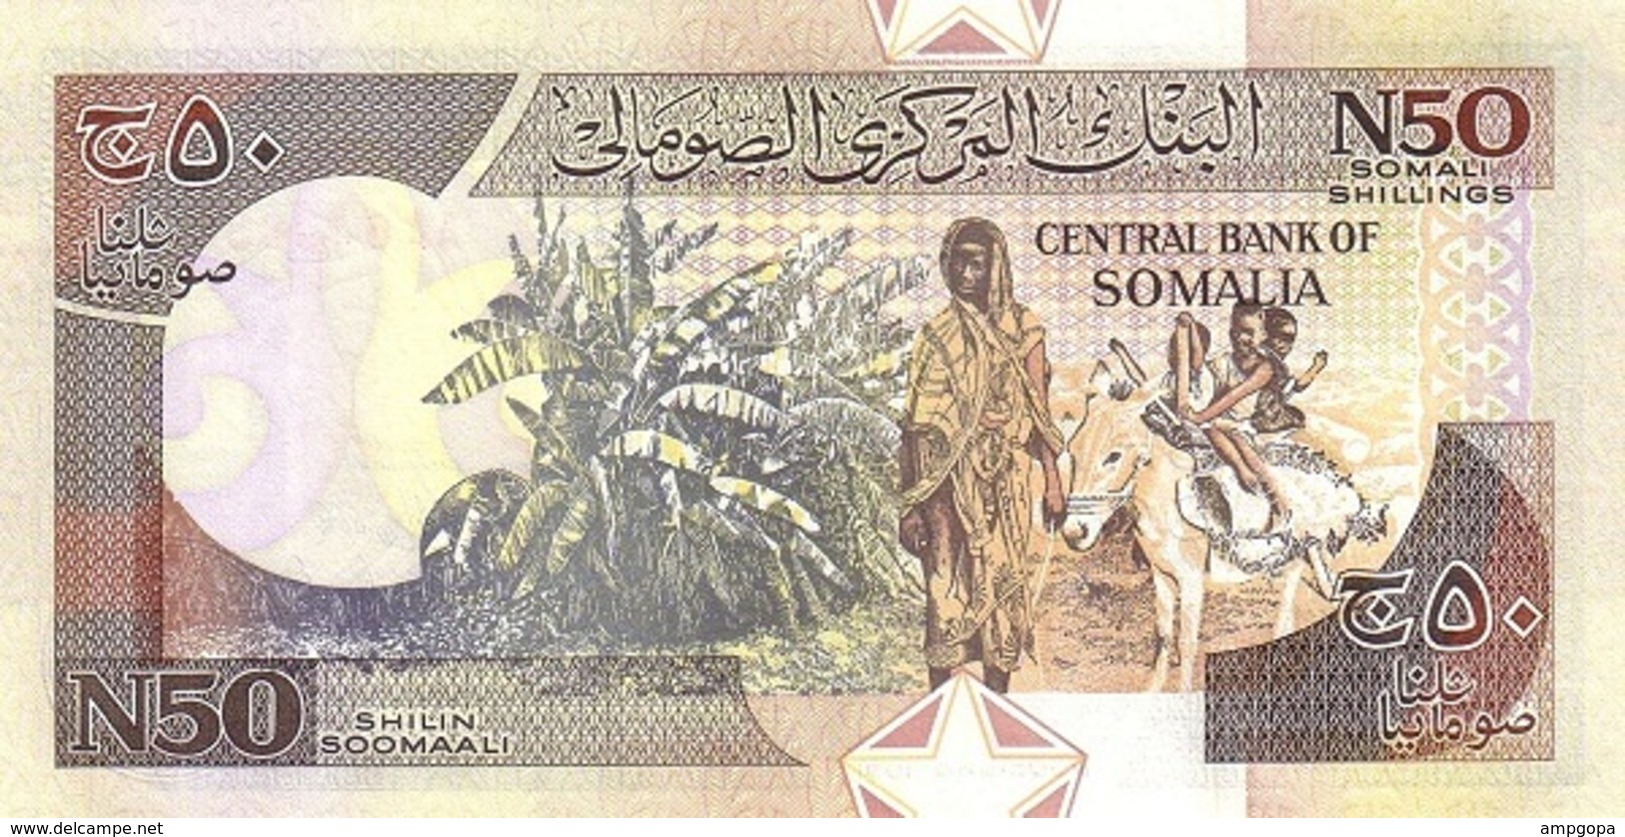 Somalia 50 Shilin 1991 Pk-r 2 UNC - Somalia